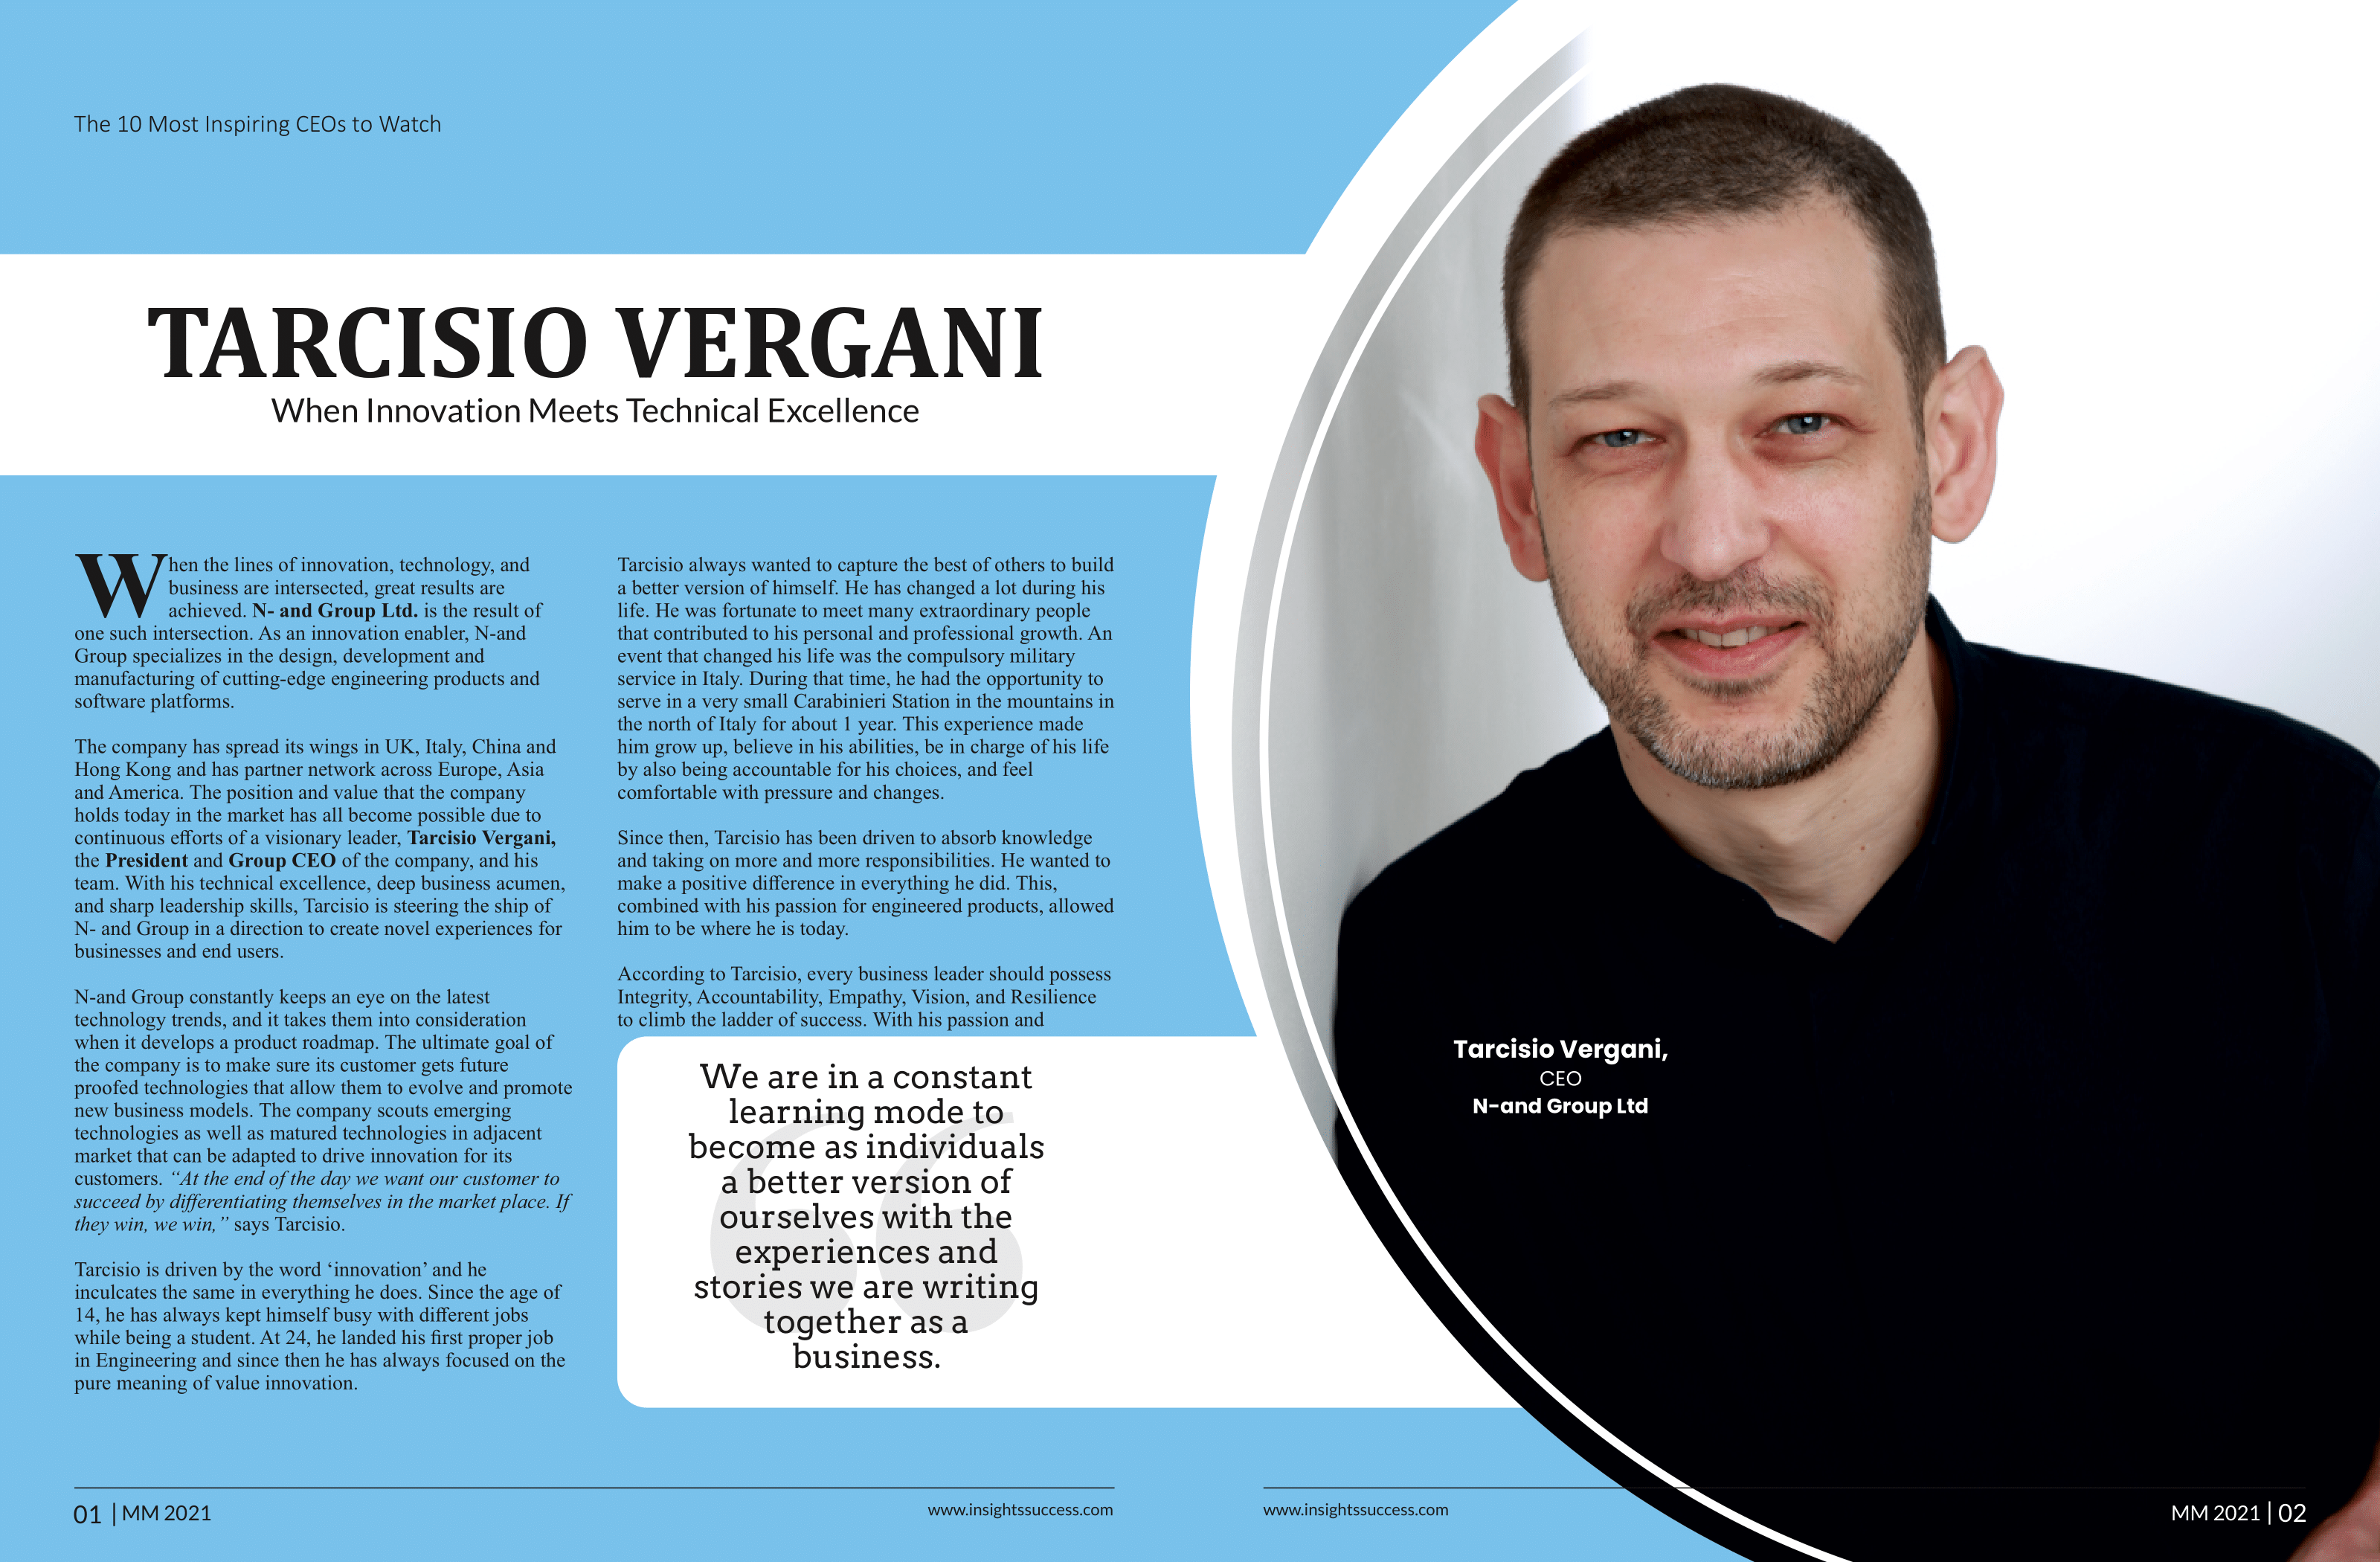 Tarcisio Vergani 10 Most Inspiring CEOs to watch-1